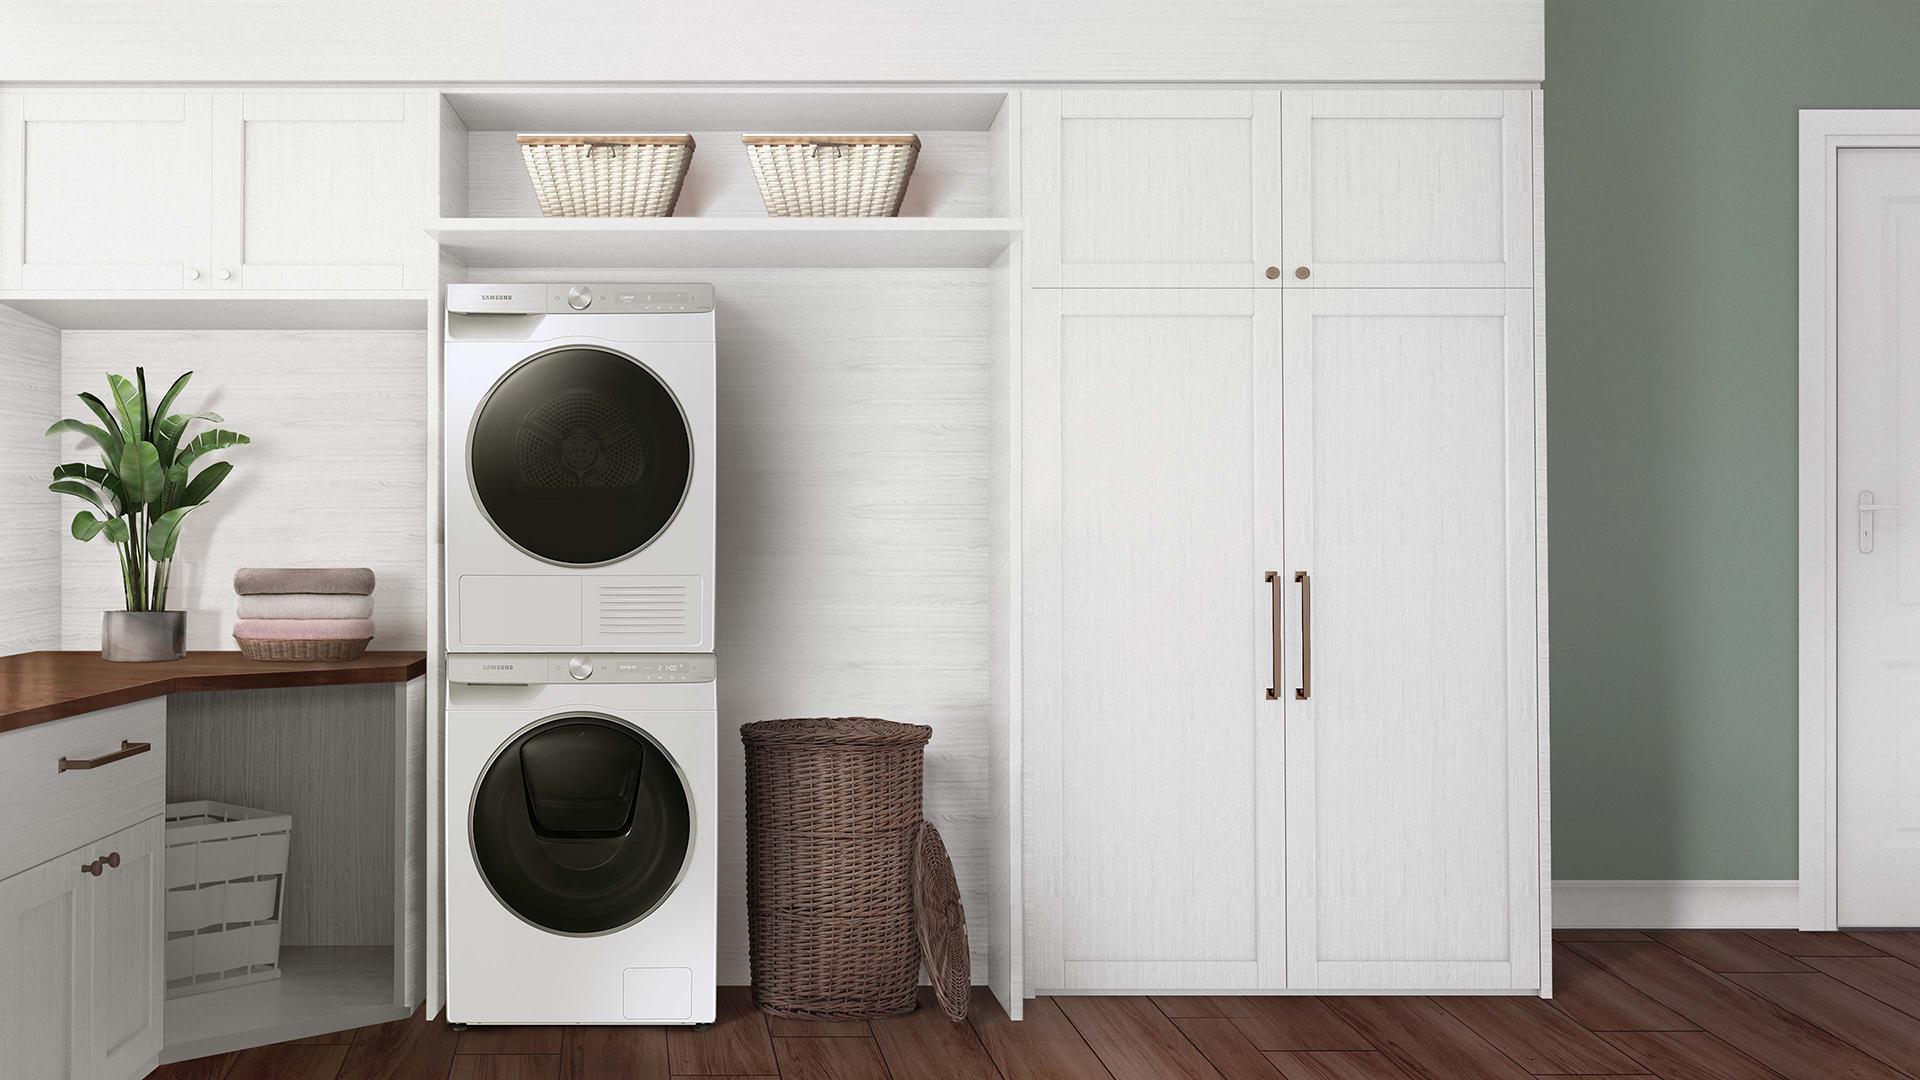 squarerooms samsung washer dryer quickdrive new washing machine appliance laundry white